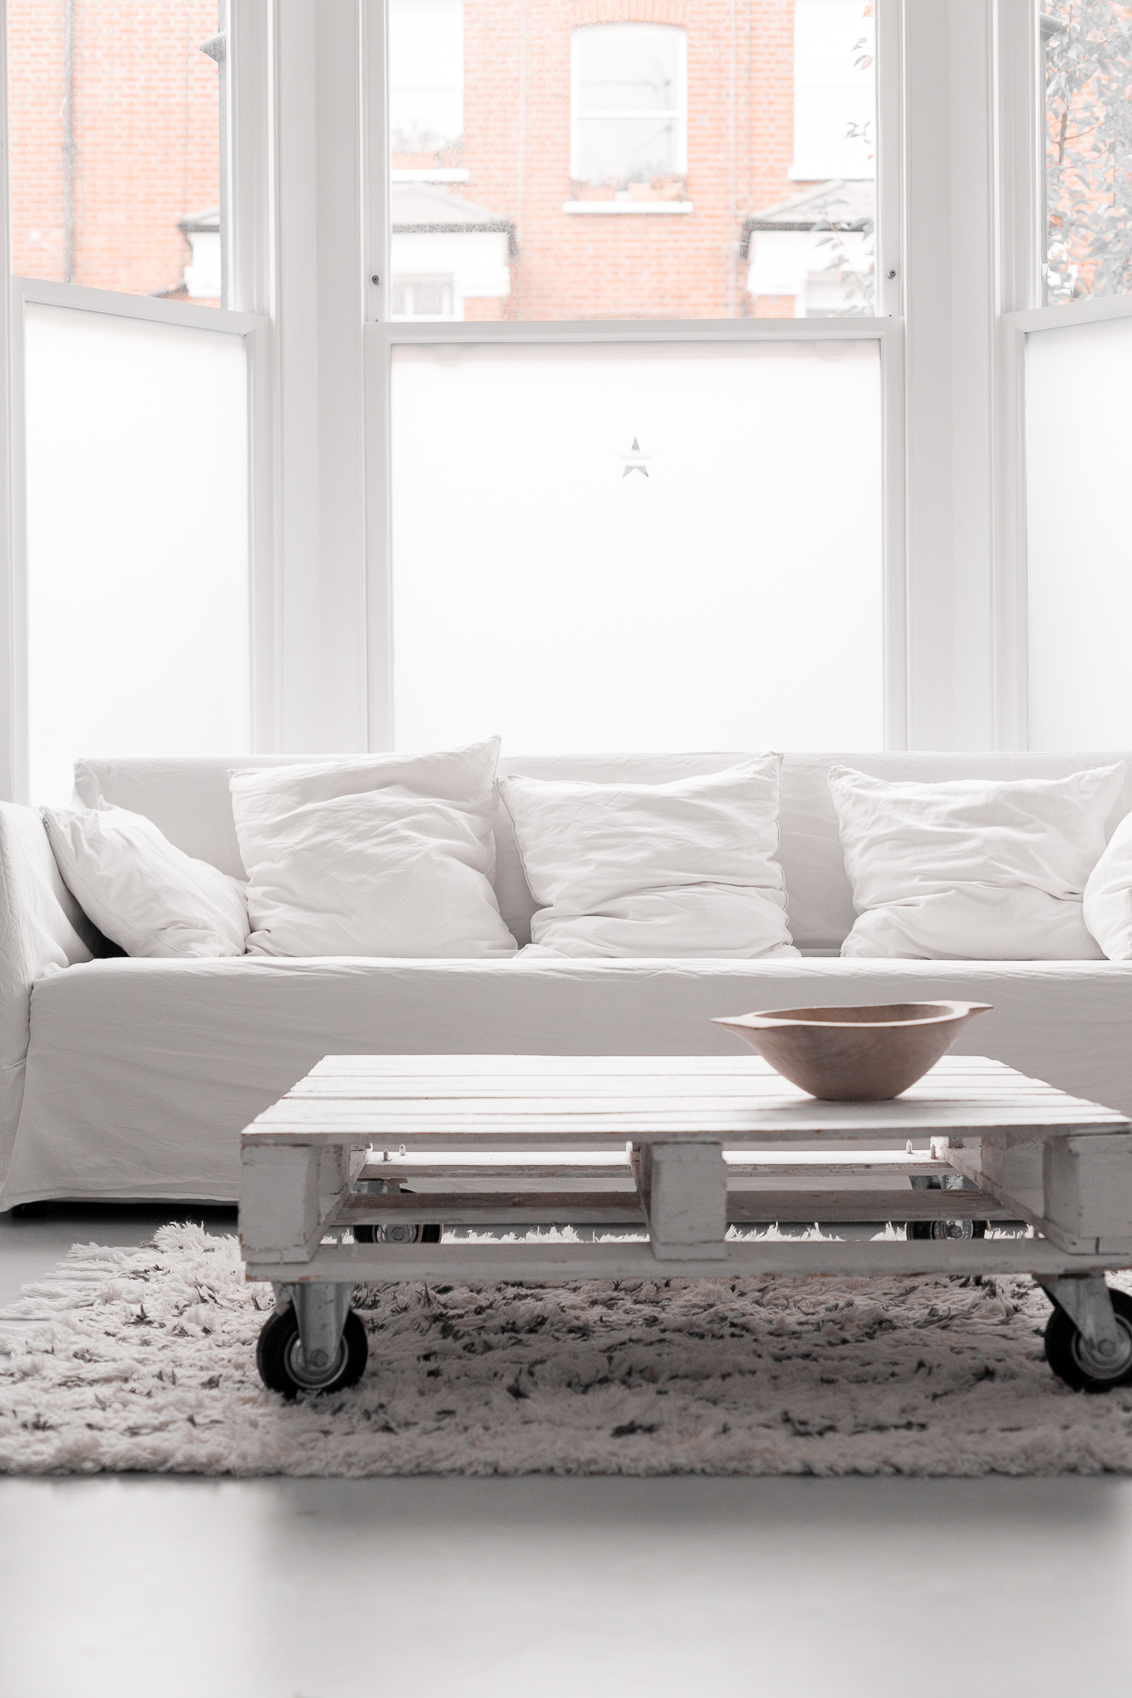 BODIE and FOU interior design, fashion, lifestyle blog